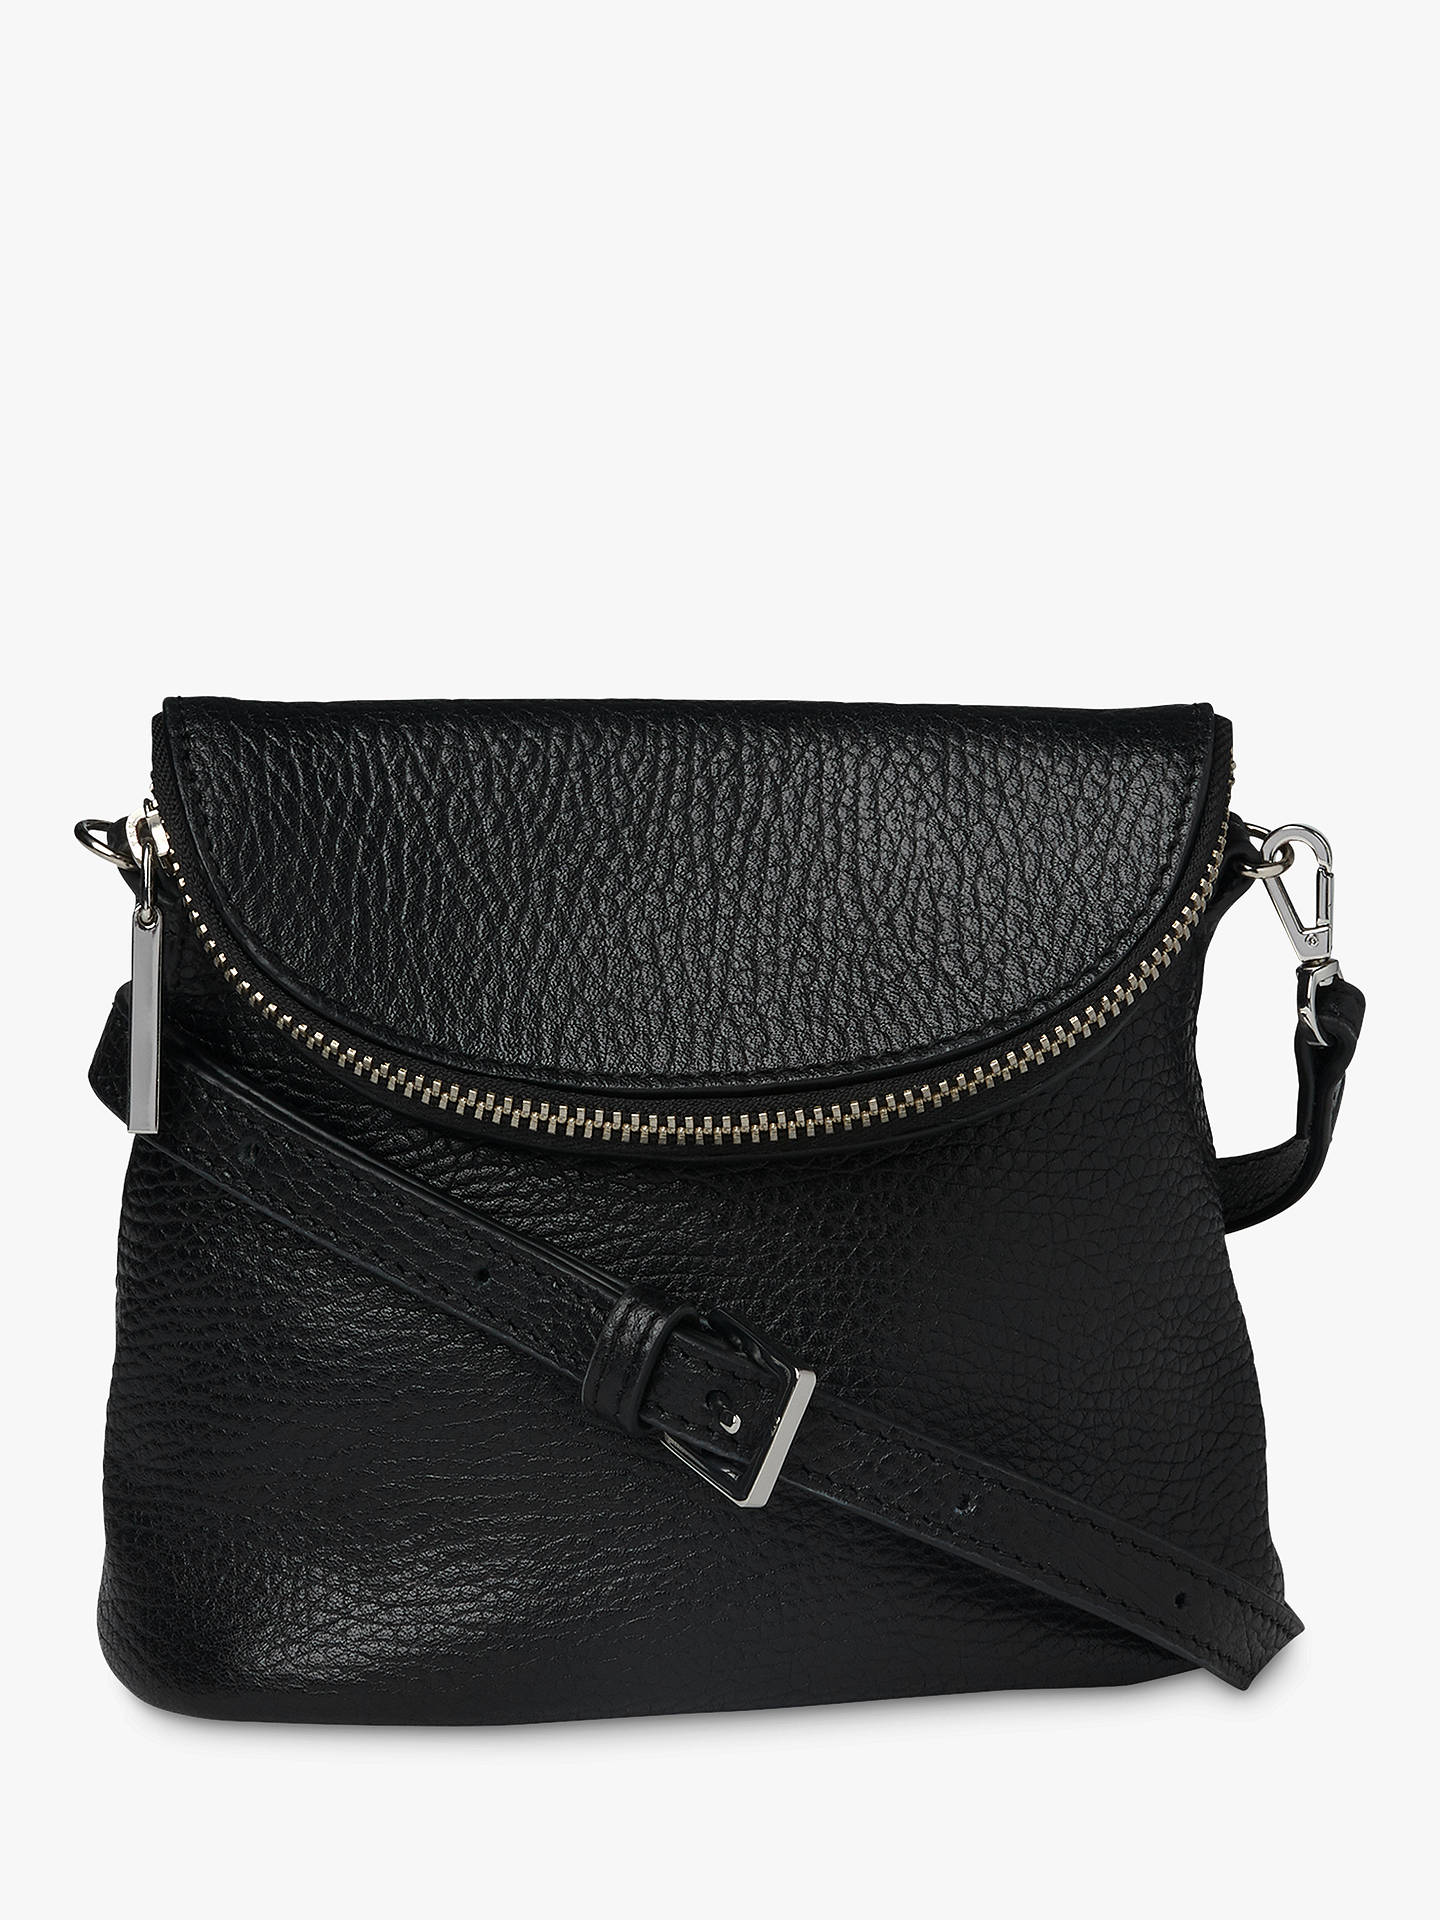 d9d0b38a7161 Buy Whistles Victoria Mini Cross Body Bag, Black Online at johnlewis.com ...